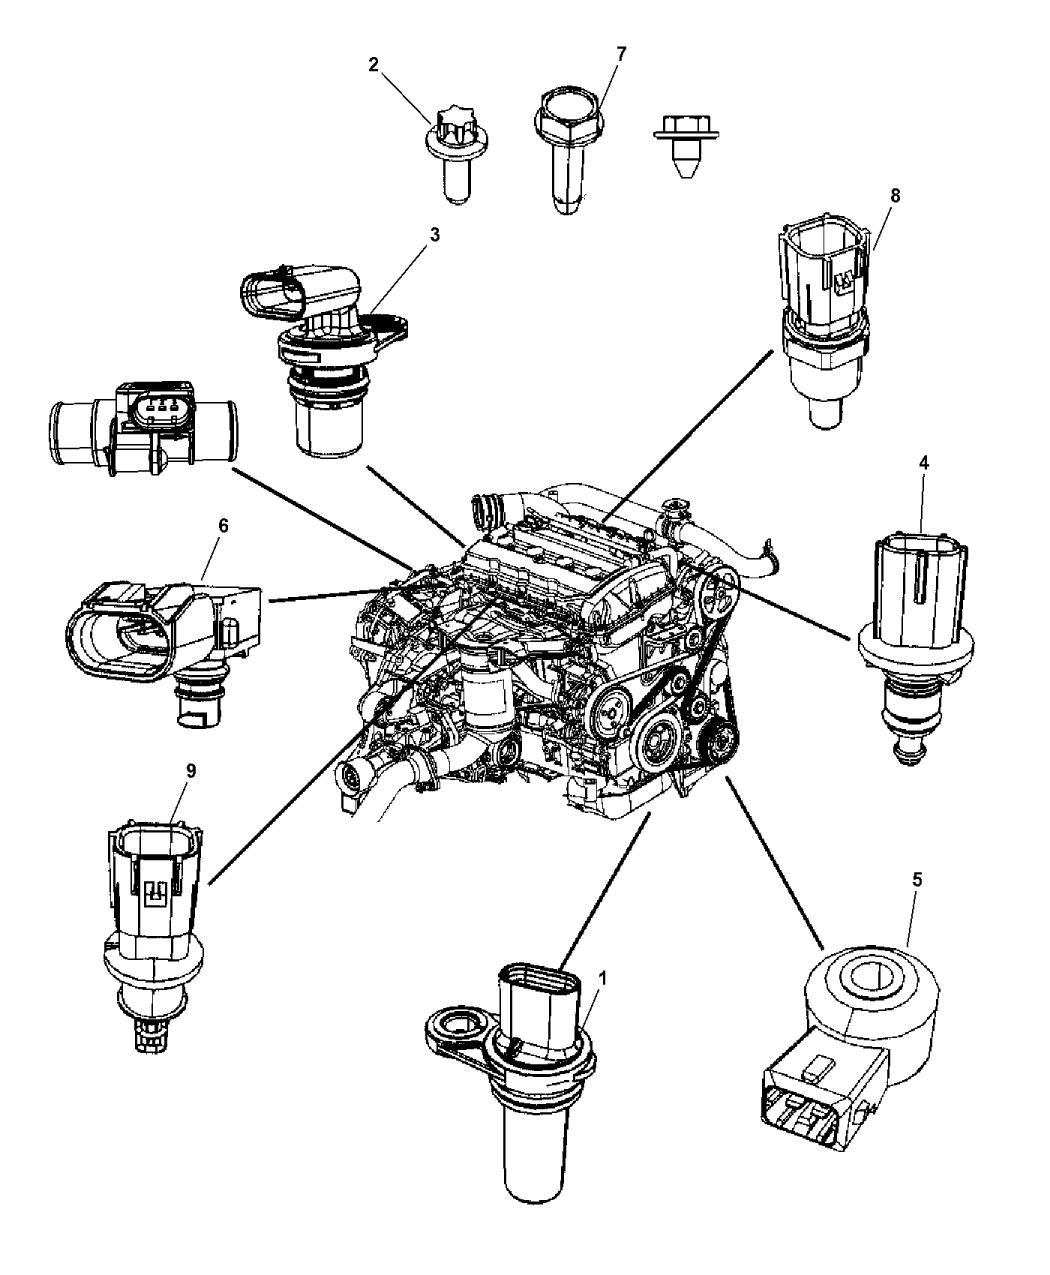 2014 Jeep Patriot Sensors - Engine